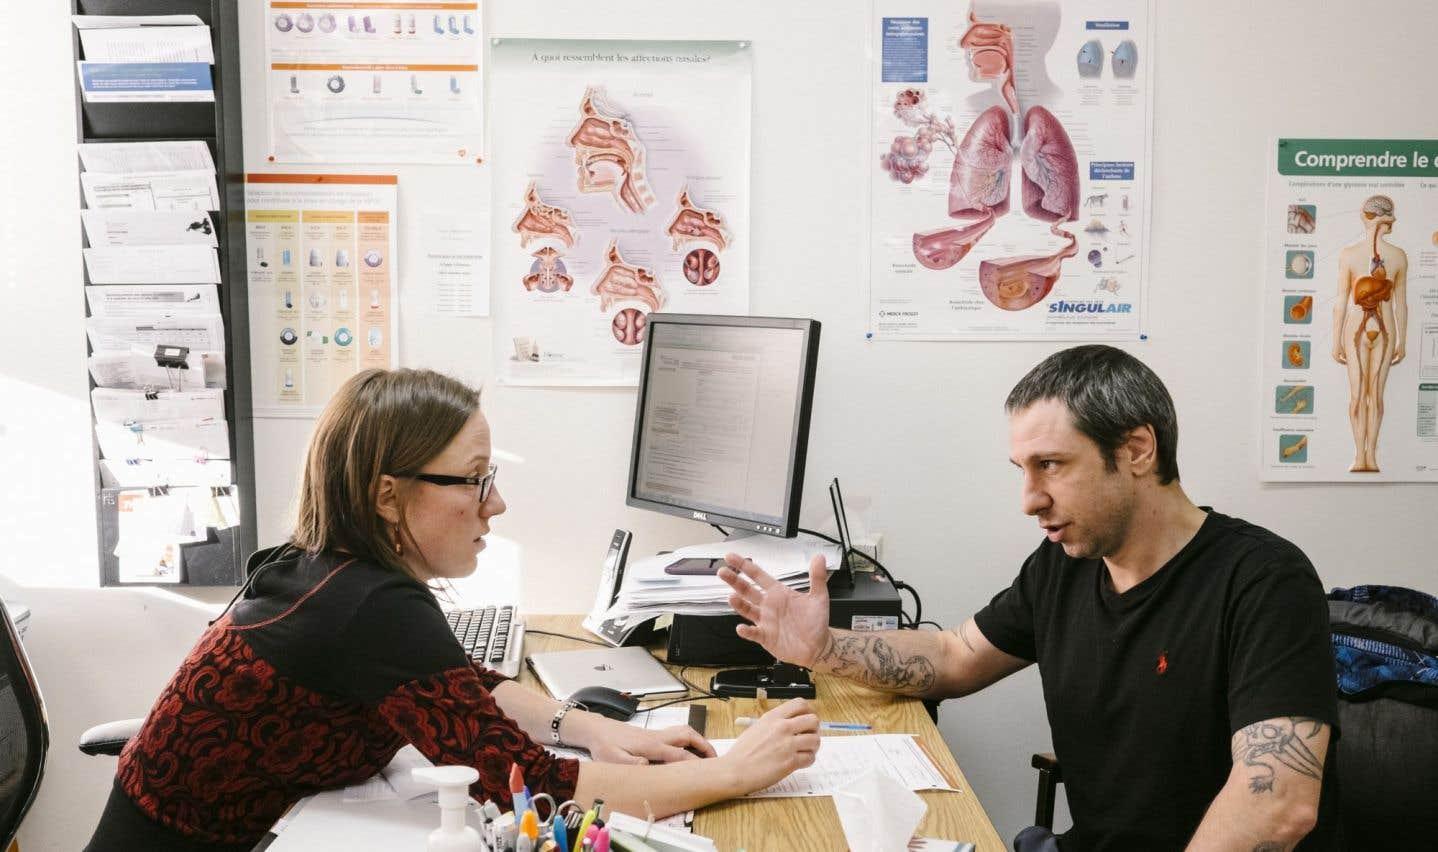 La clinique SABSA devient partenaire de Québec